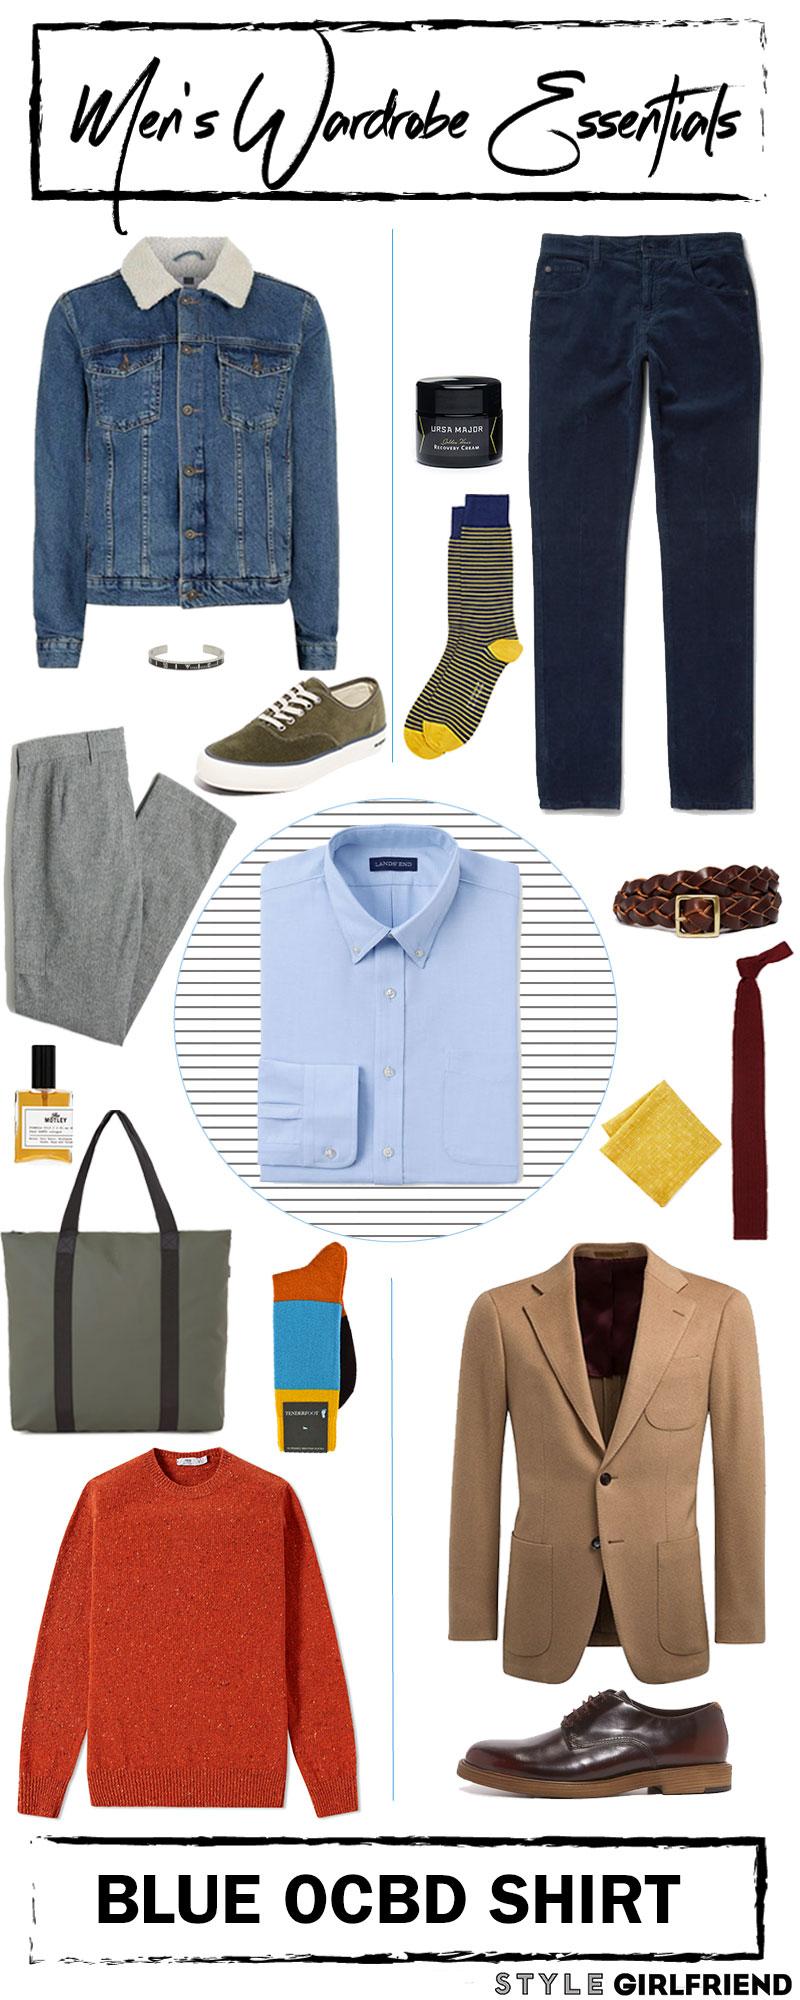 ocbd shirt, oxford shirt, menswear flatlay, flatlay, denim mens jacket, grey trousers, orange sweatshirt, ocbd shirt, style girlfriend,